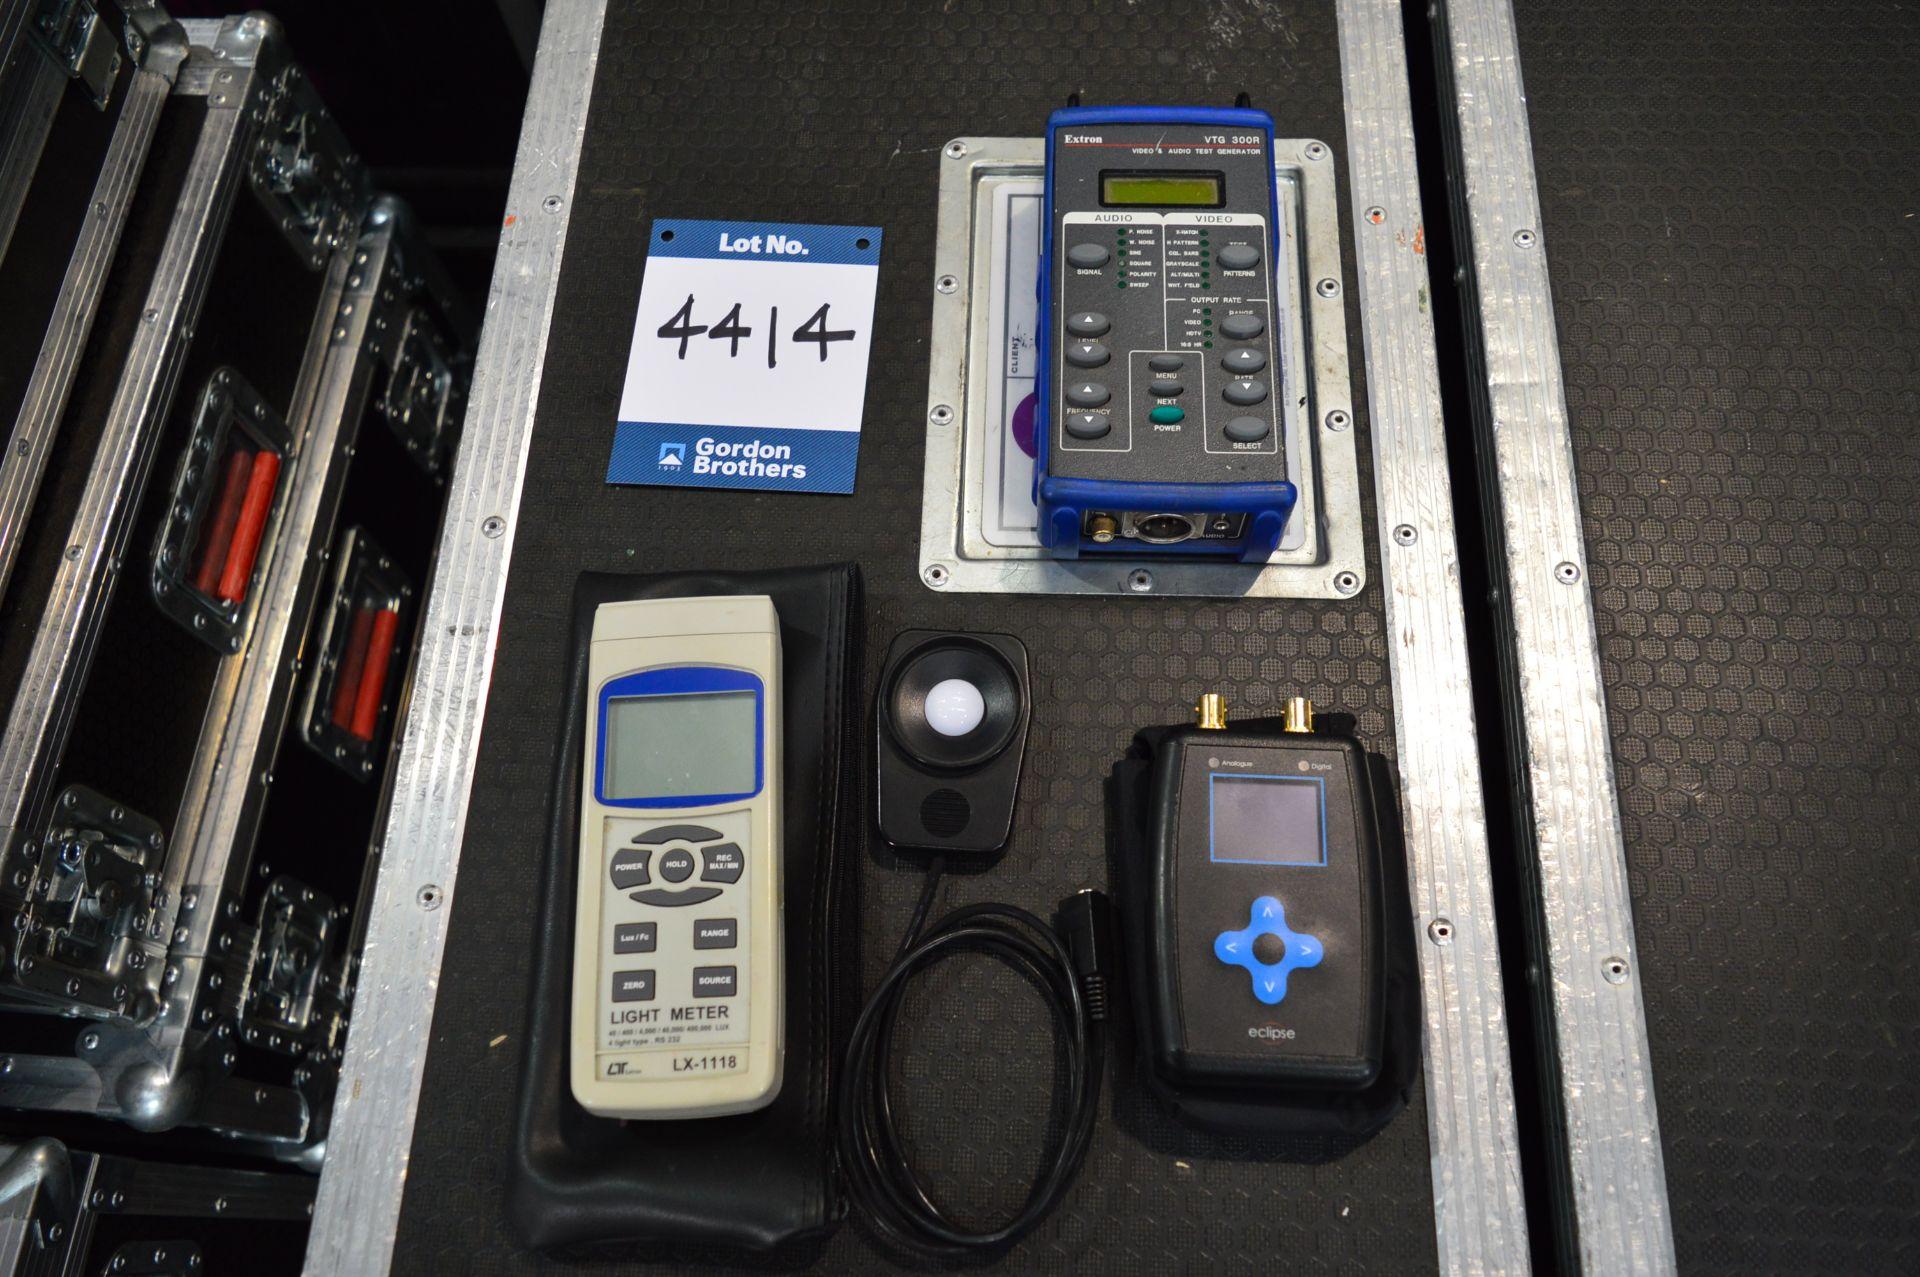 Lot 4414 - 1x Extron VTG 300R video & audio test generator, 1x Lutron LX-1118 light meter and 1x Eclipse test